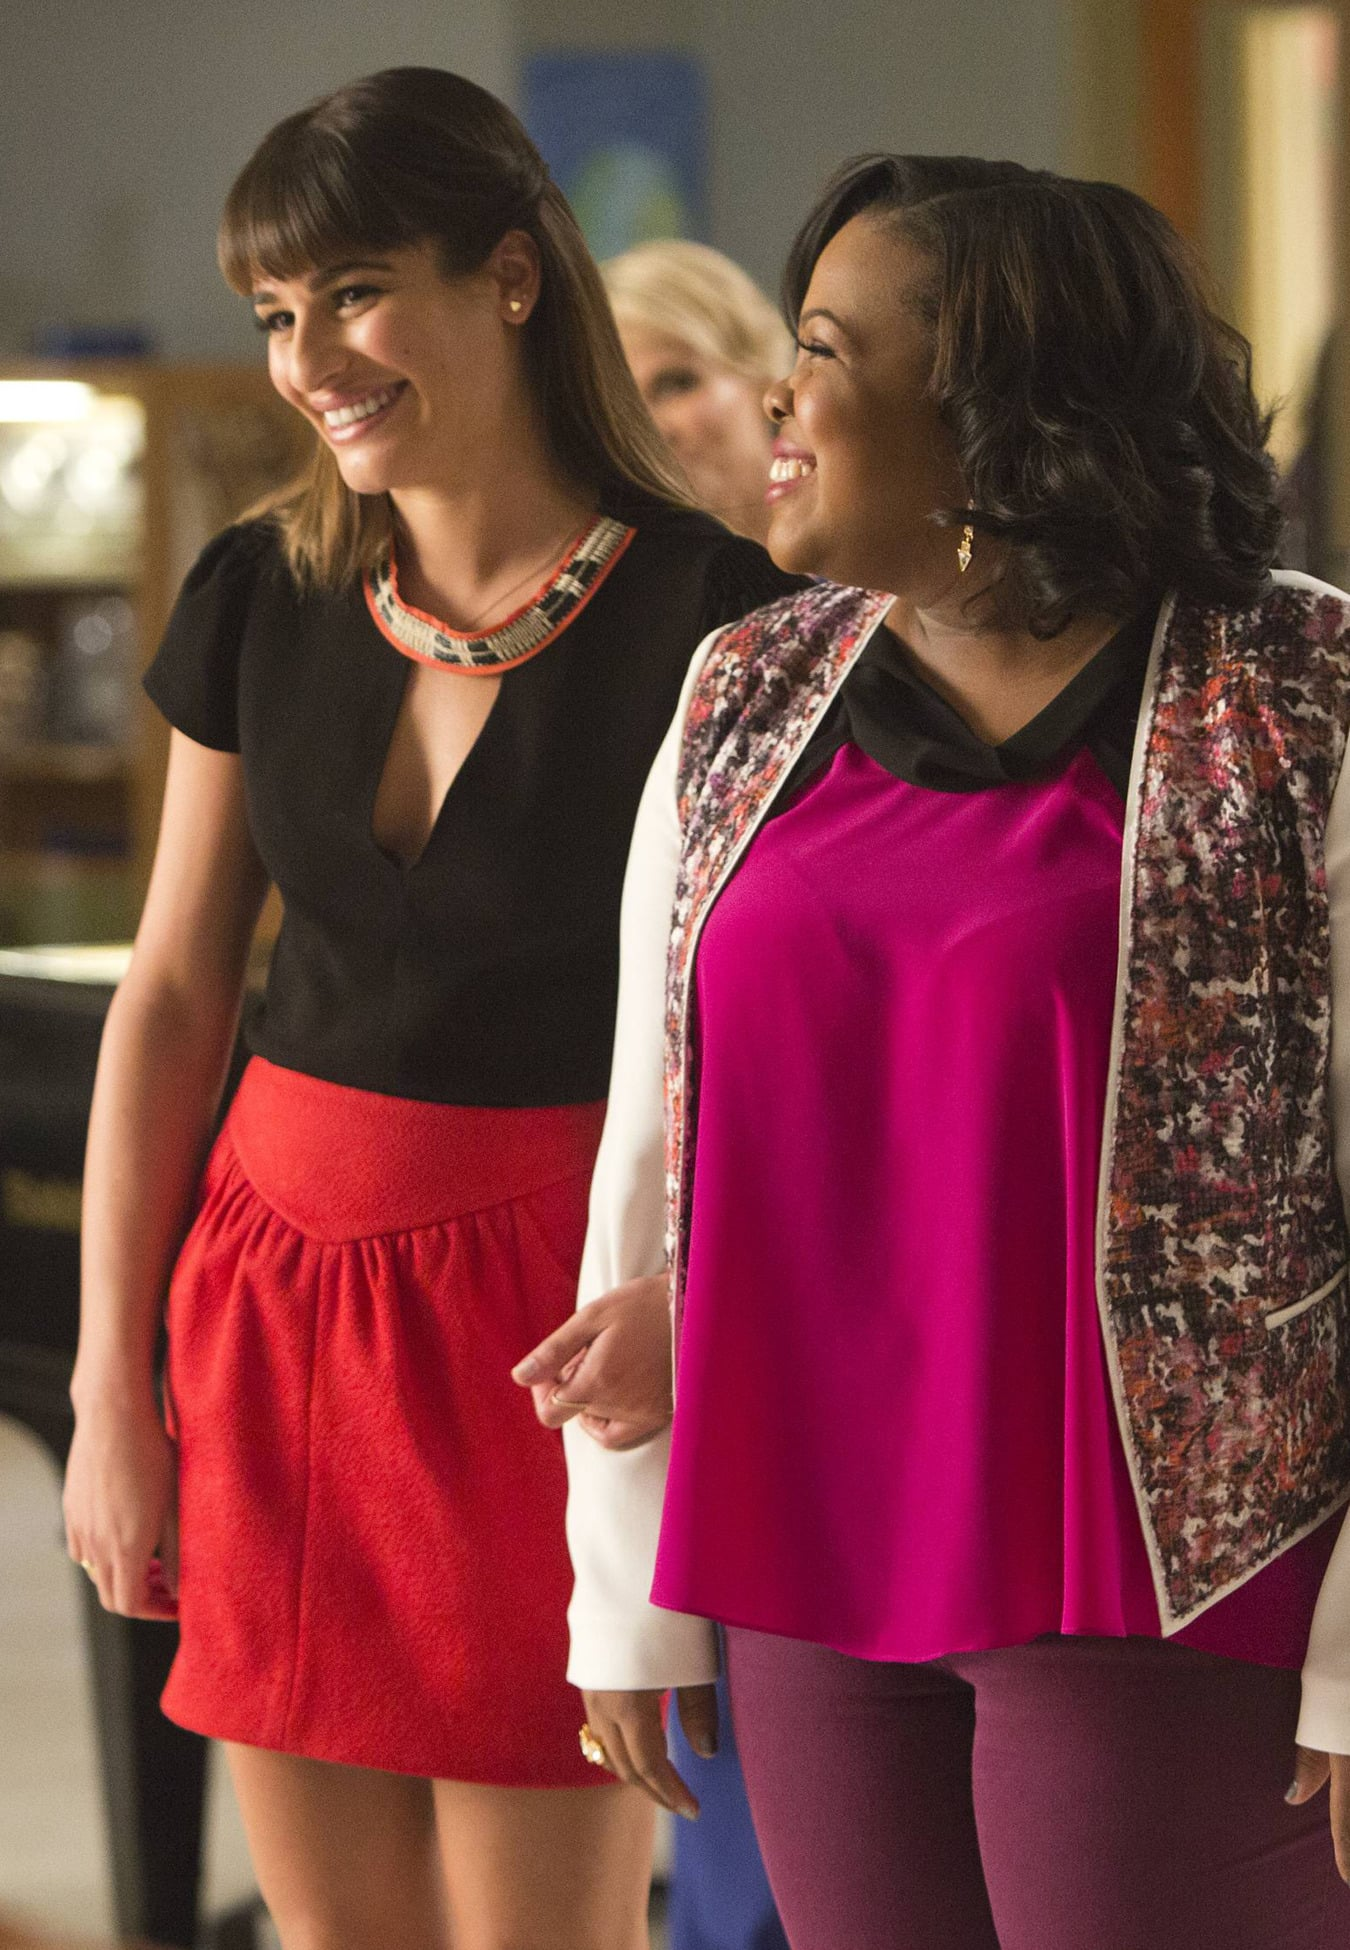 Rachel and Mercedes bond together back at McKinley.